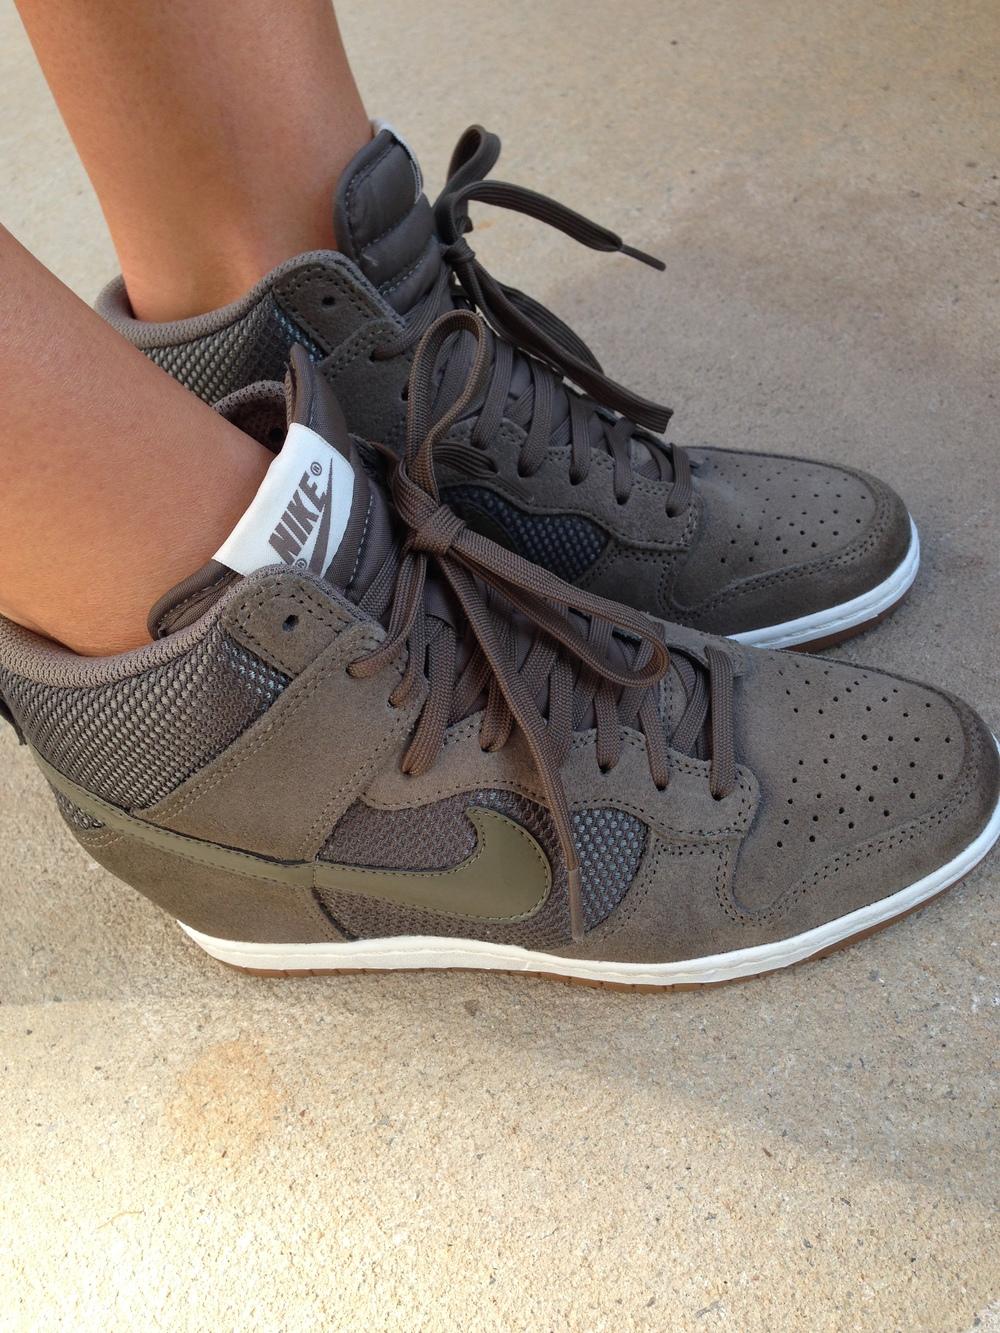 NikeHighTops